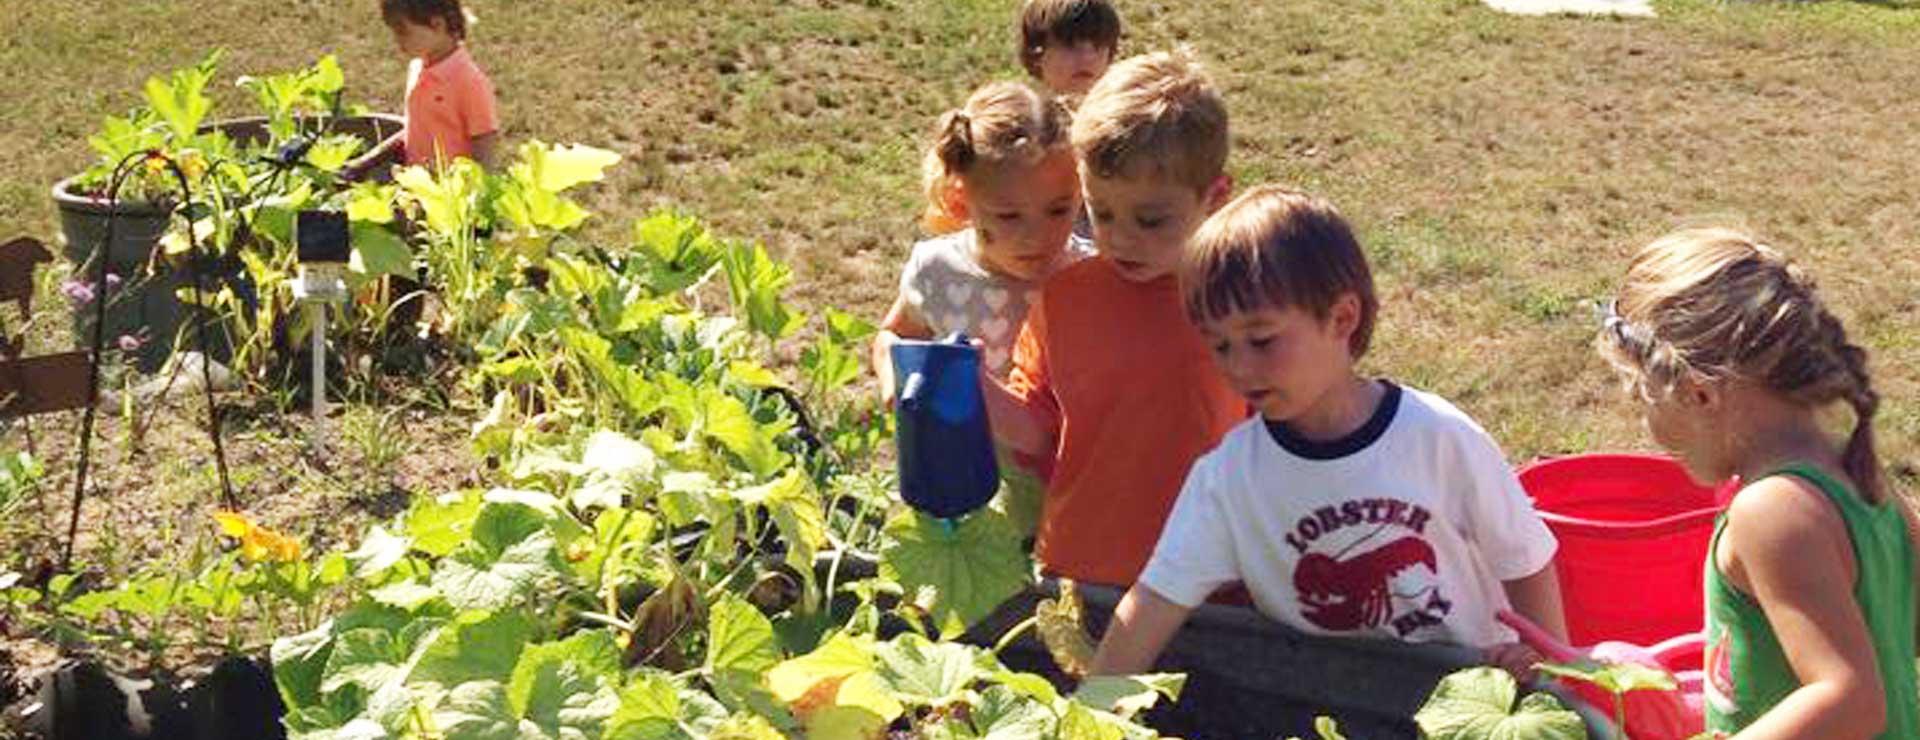 canterbury-creek-farm-preschool-grand-rapids-mi-children-learning-gardening